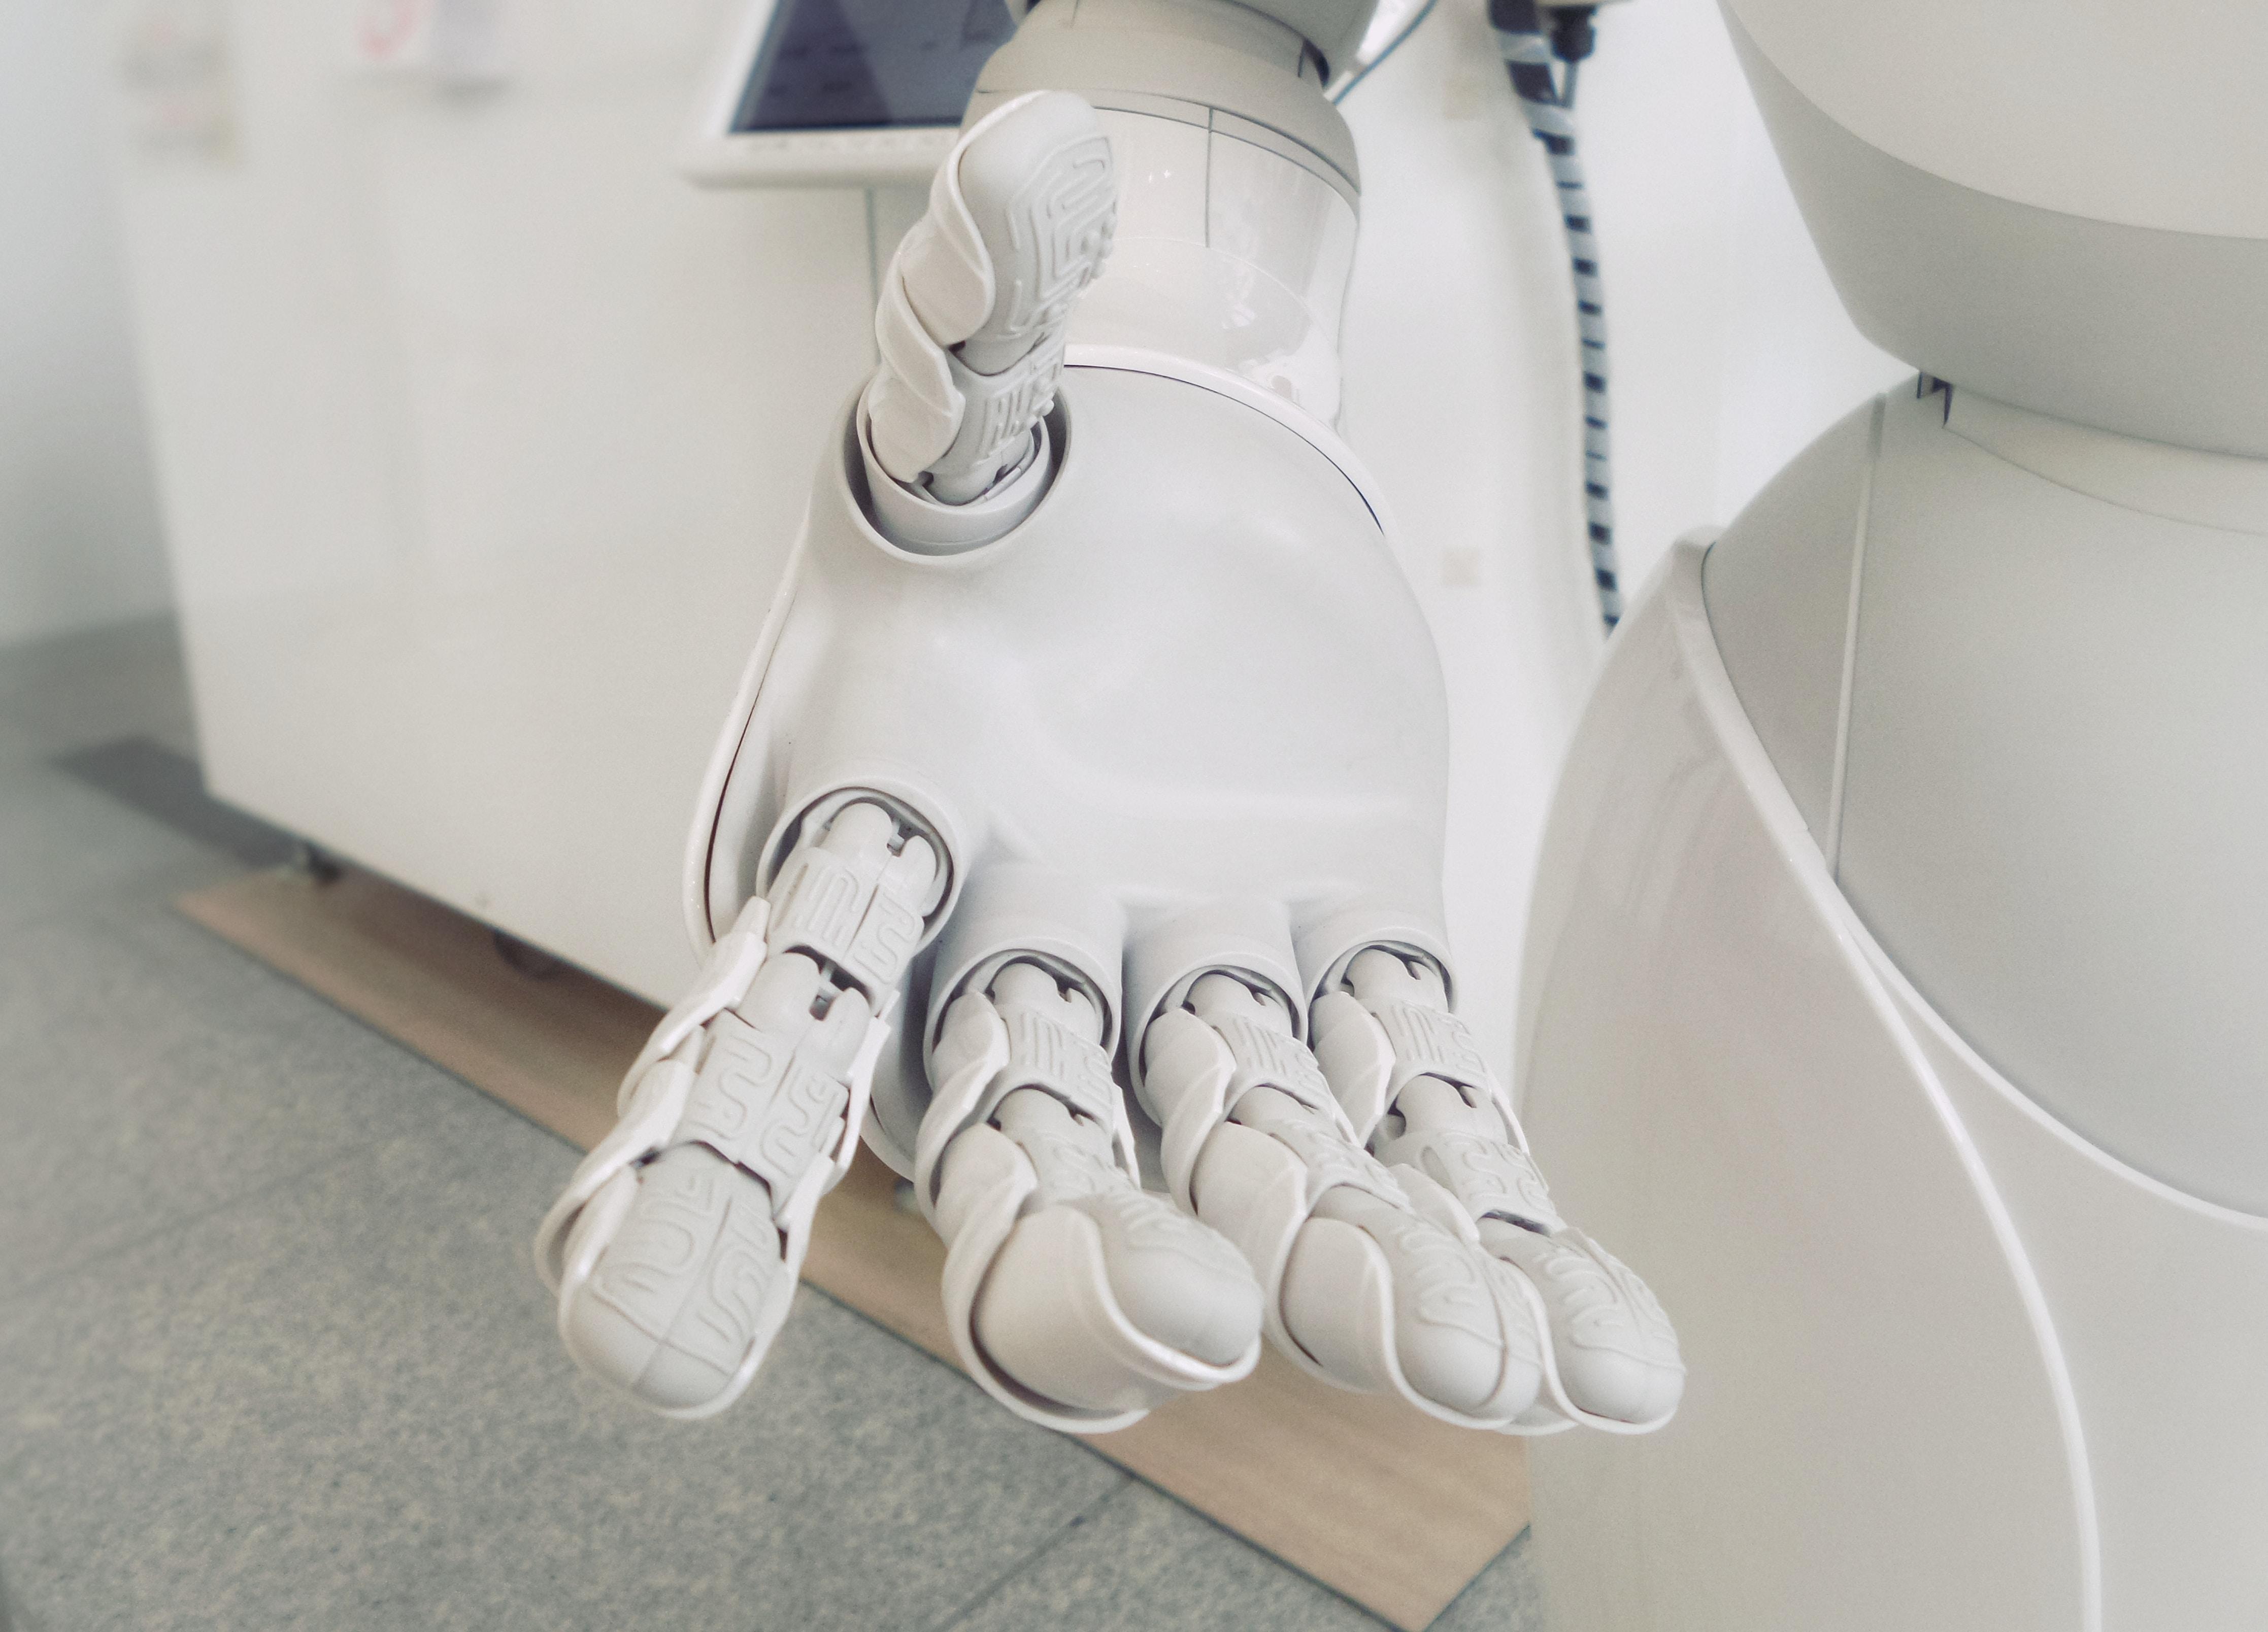 AI Already Impacting Supply Chains